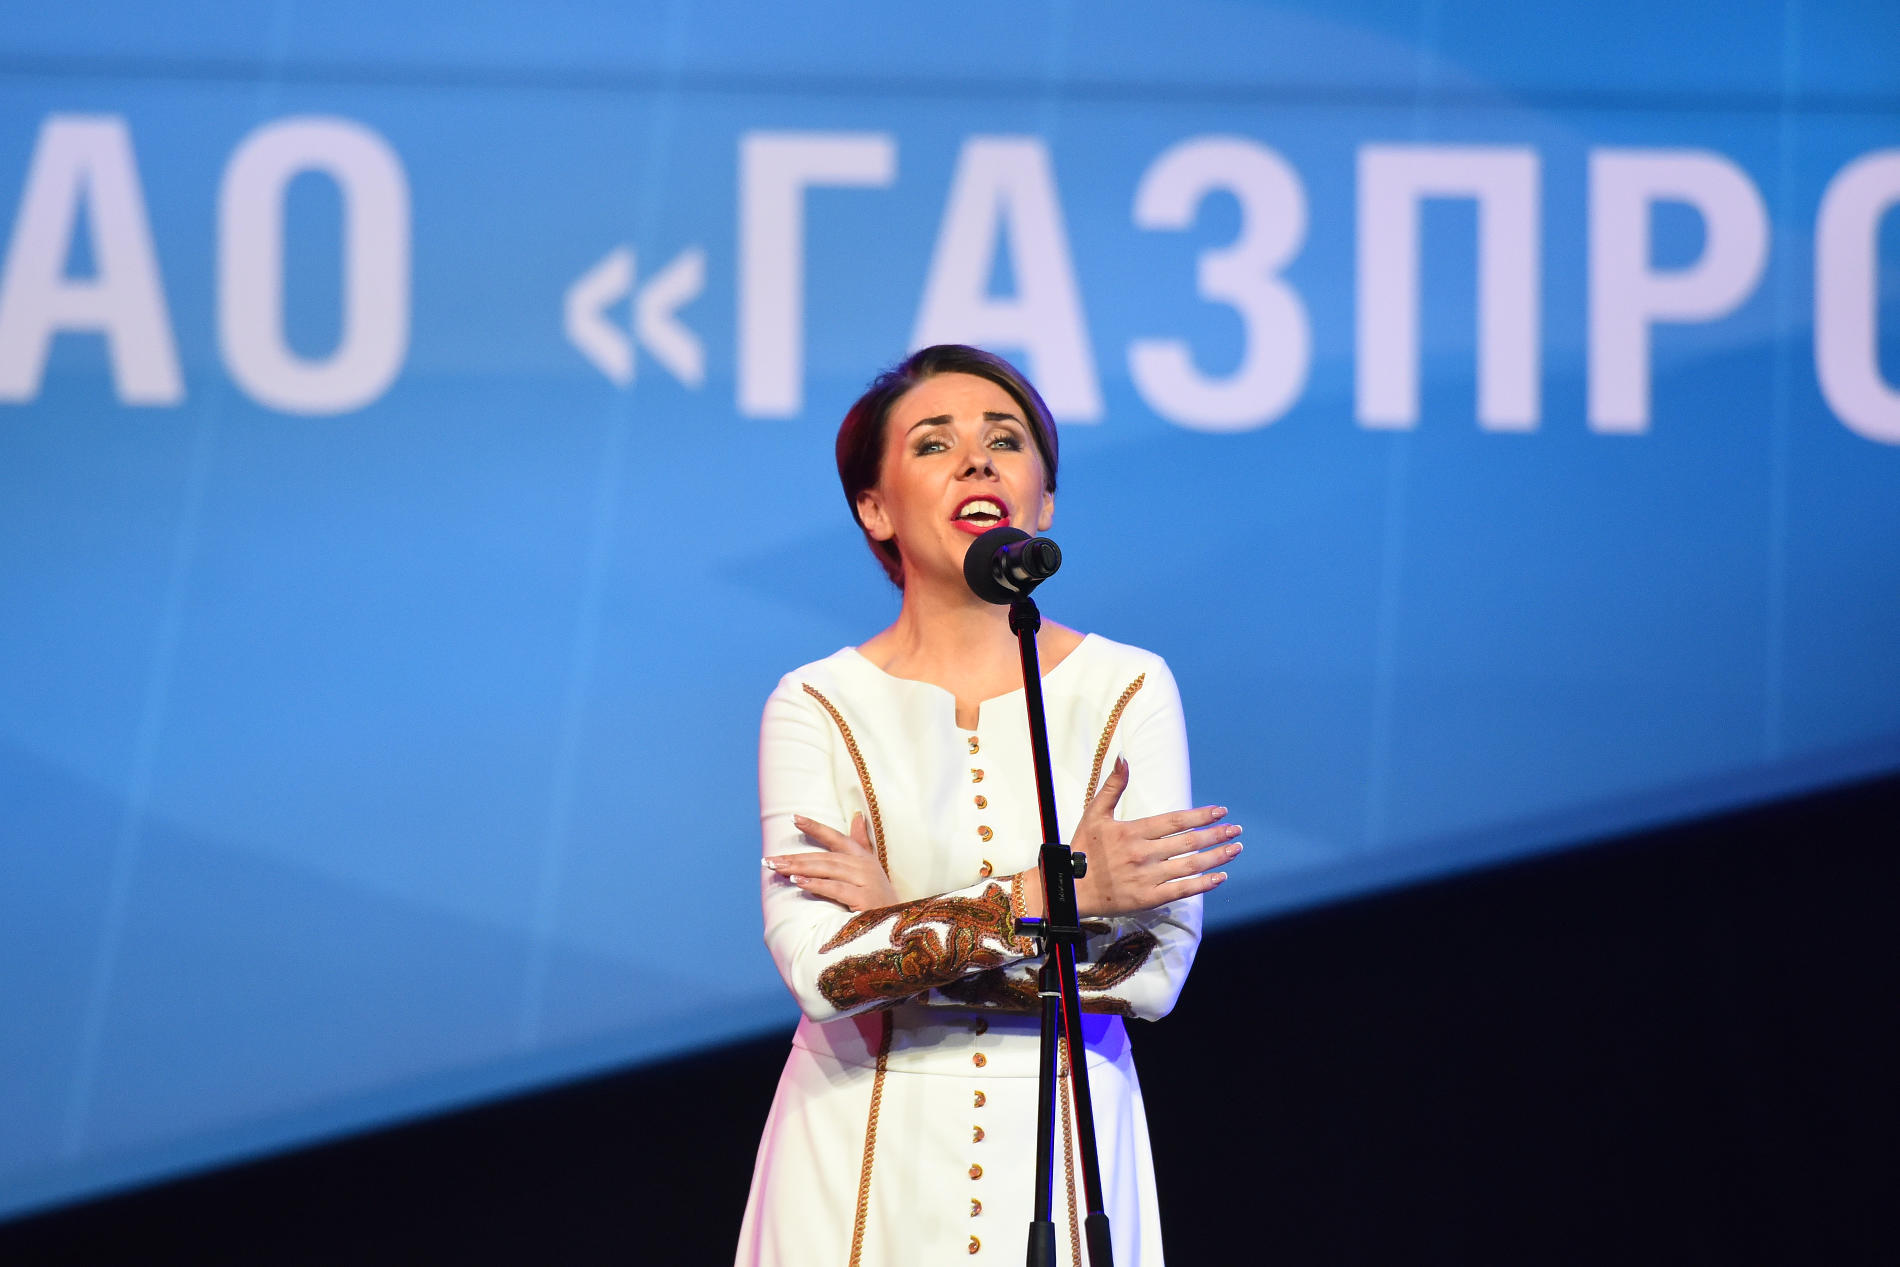 Анастасия Налобина («Газпром трансгаз Югорск»)